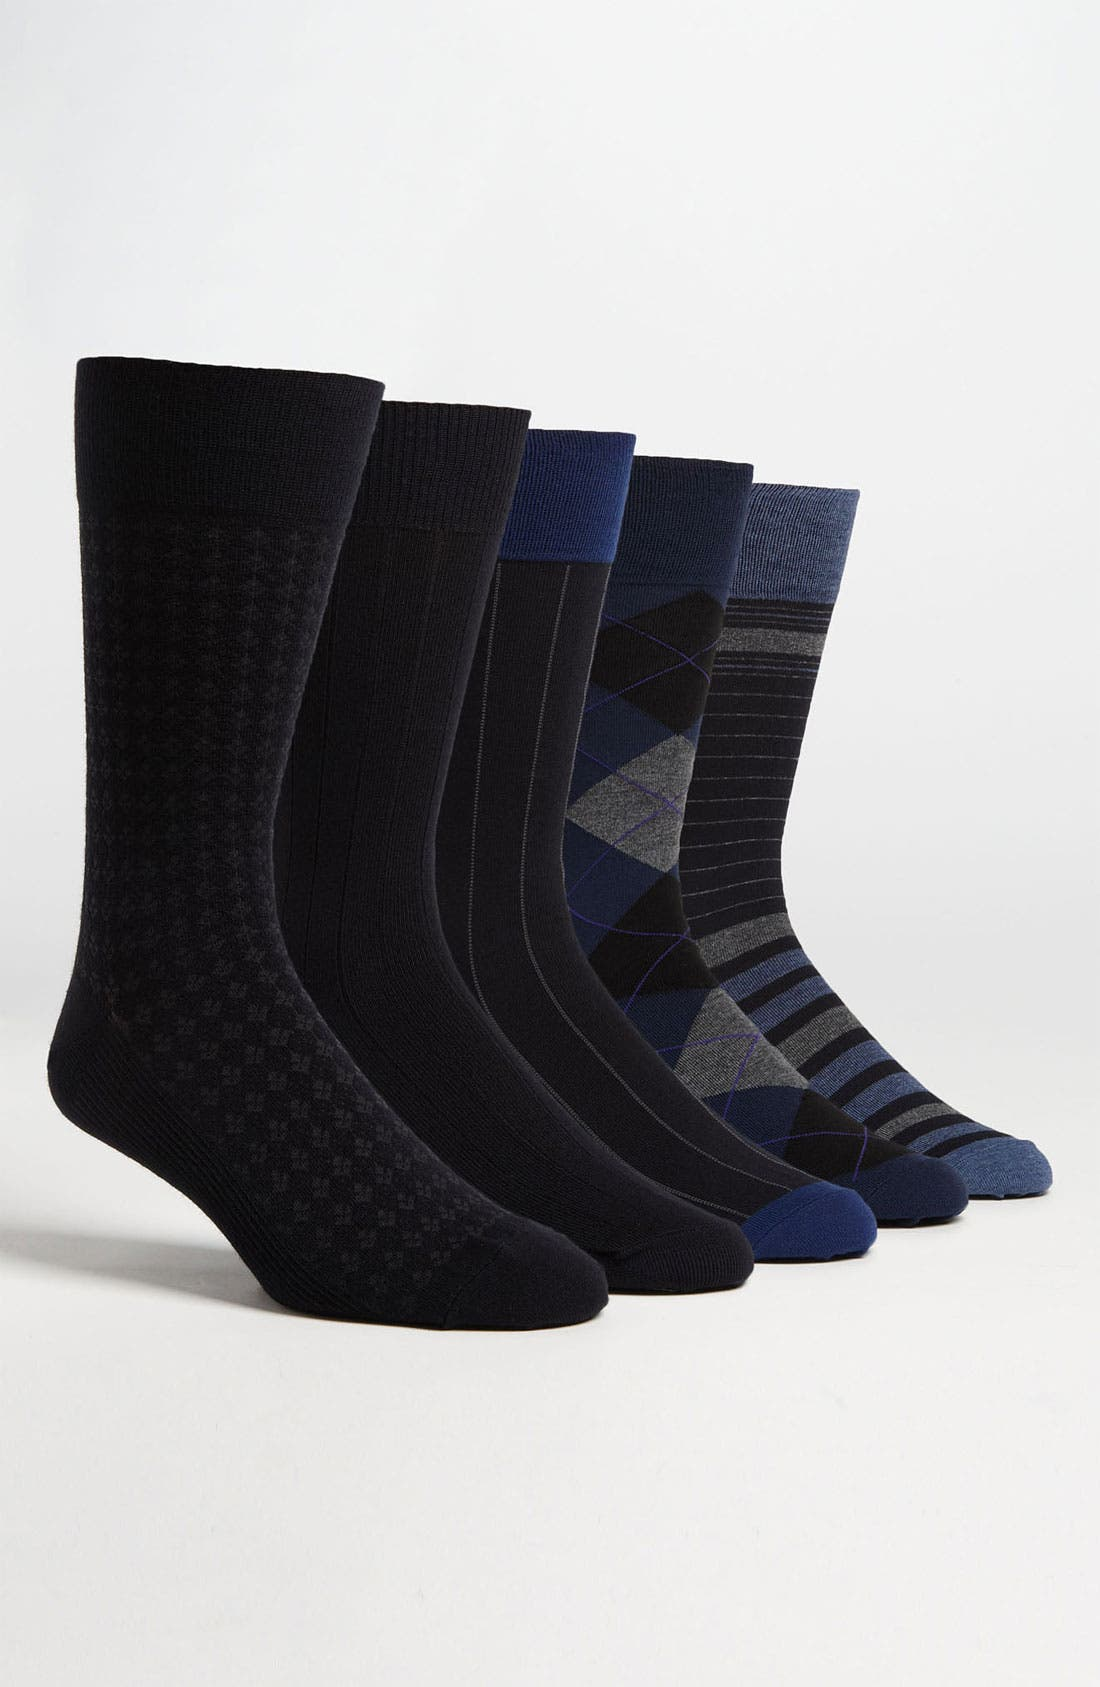 Alternate Image 1 Selected - Cole Haan Assorted Socks (5-Pack)